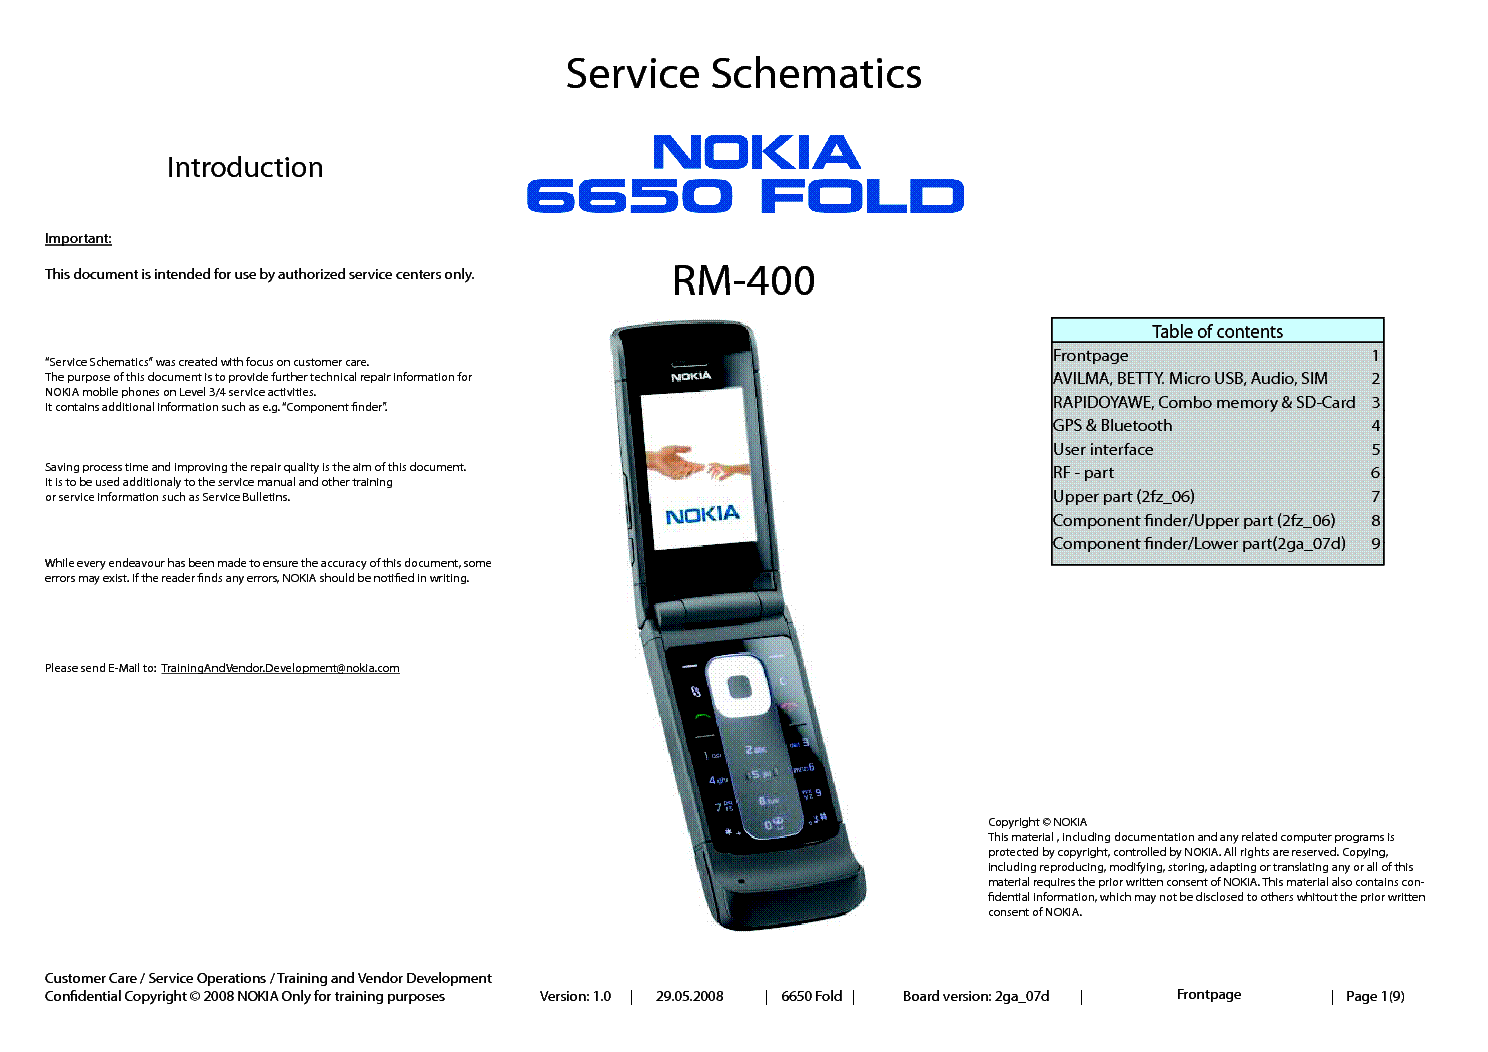 nokia 6650 fold rm 400 service schematics v1 0 sch service manual rh elektrotanya com Nokia Lumia 520 Manual iPod Manual